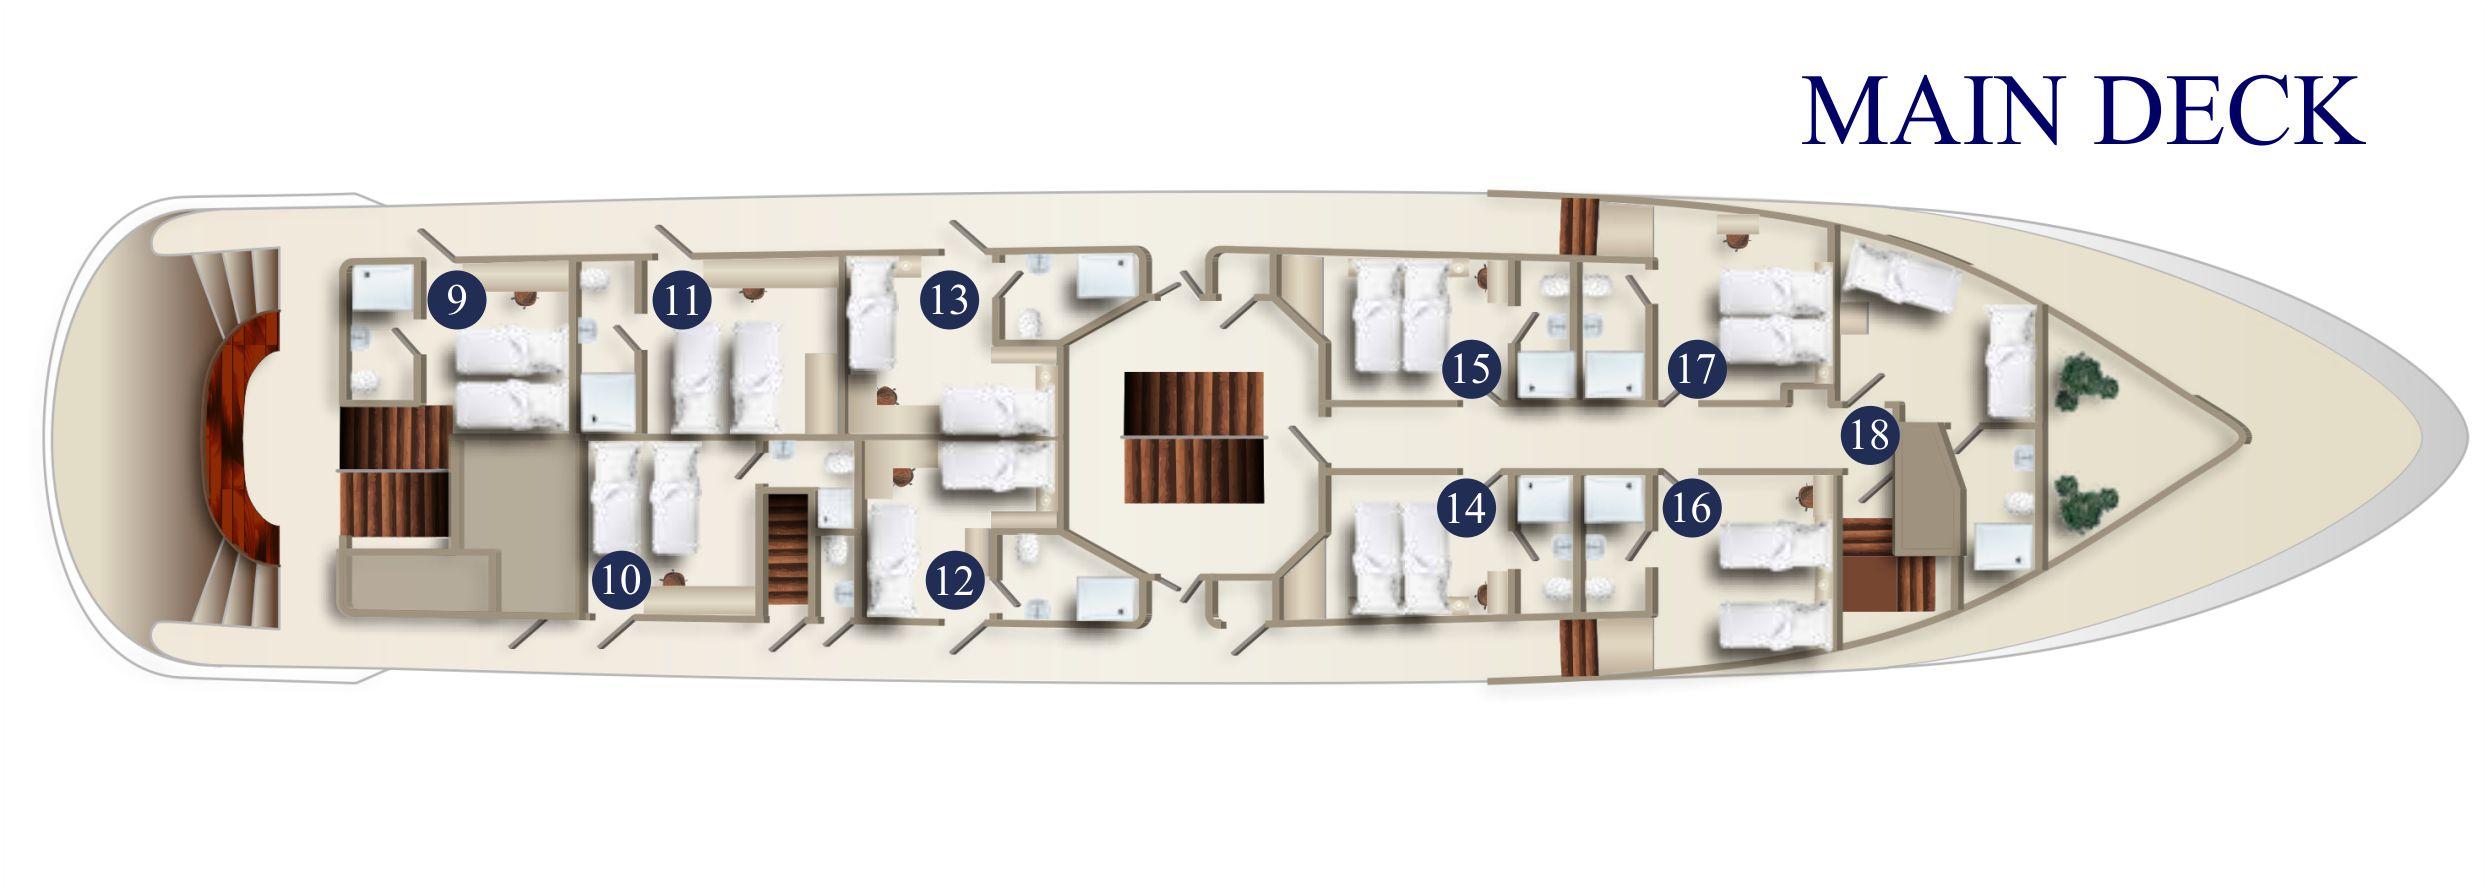 MS SAN SPIRITO main deck